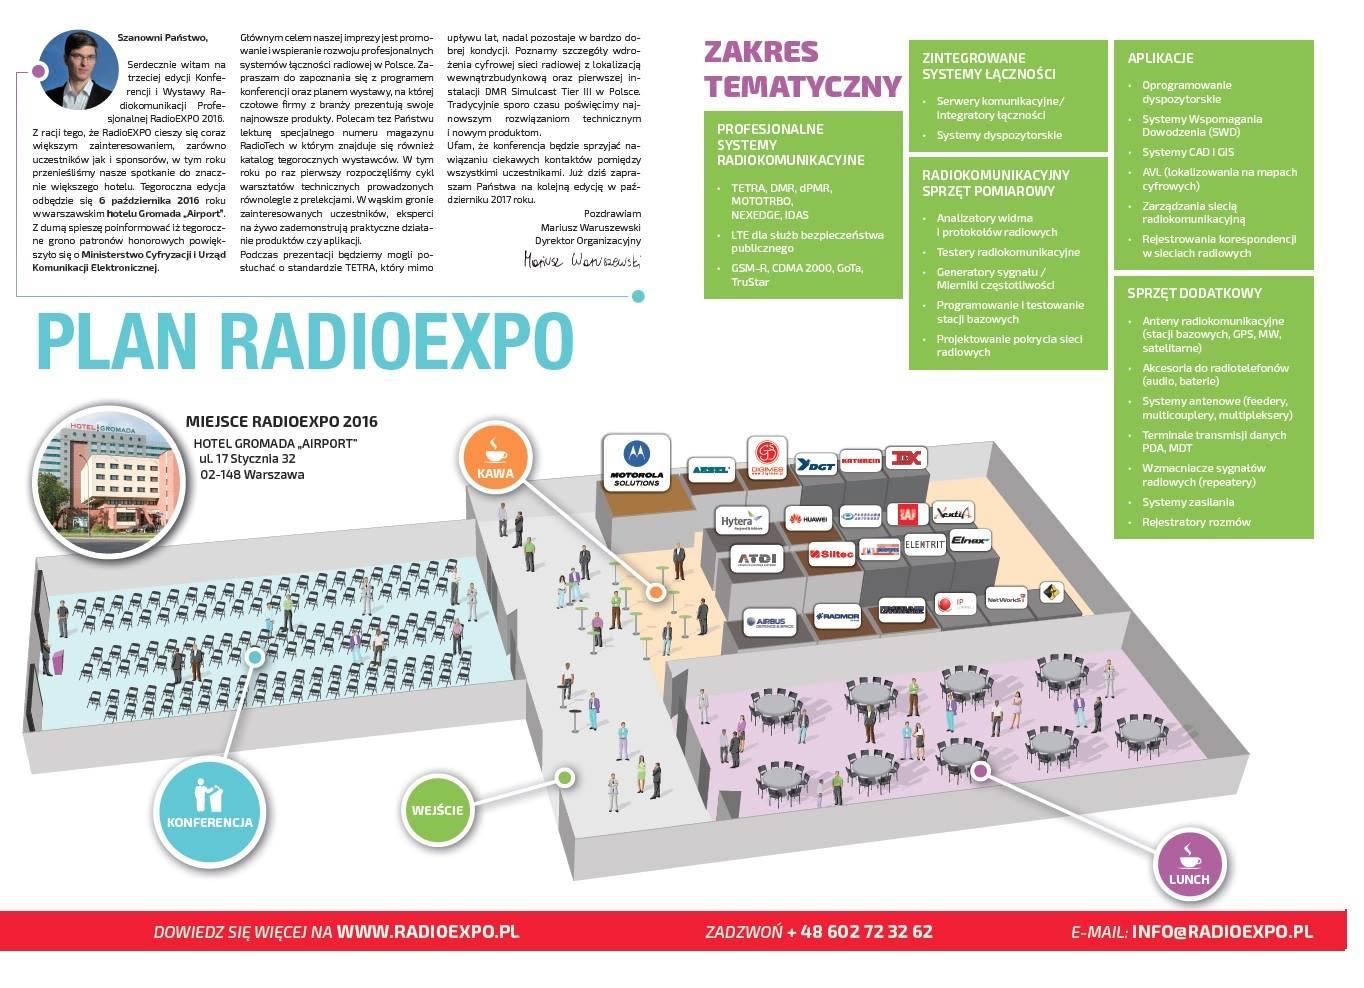 RadioEXPO-2016-agenda-plan-ekspozycji